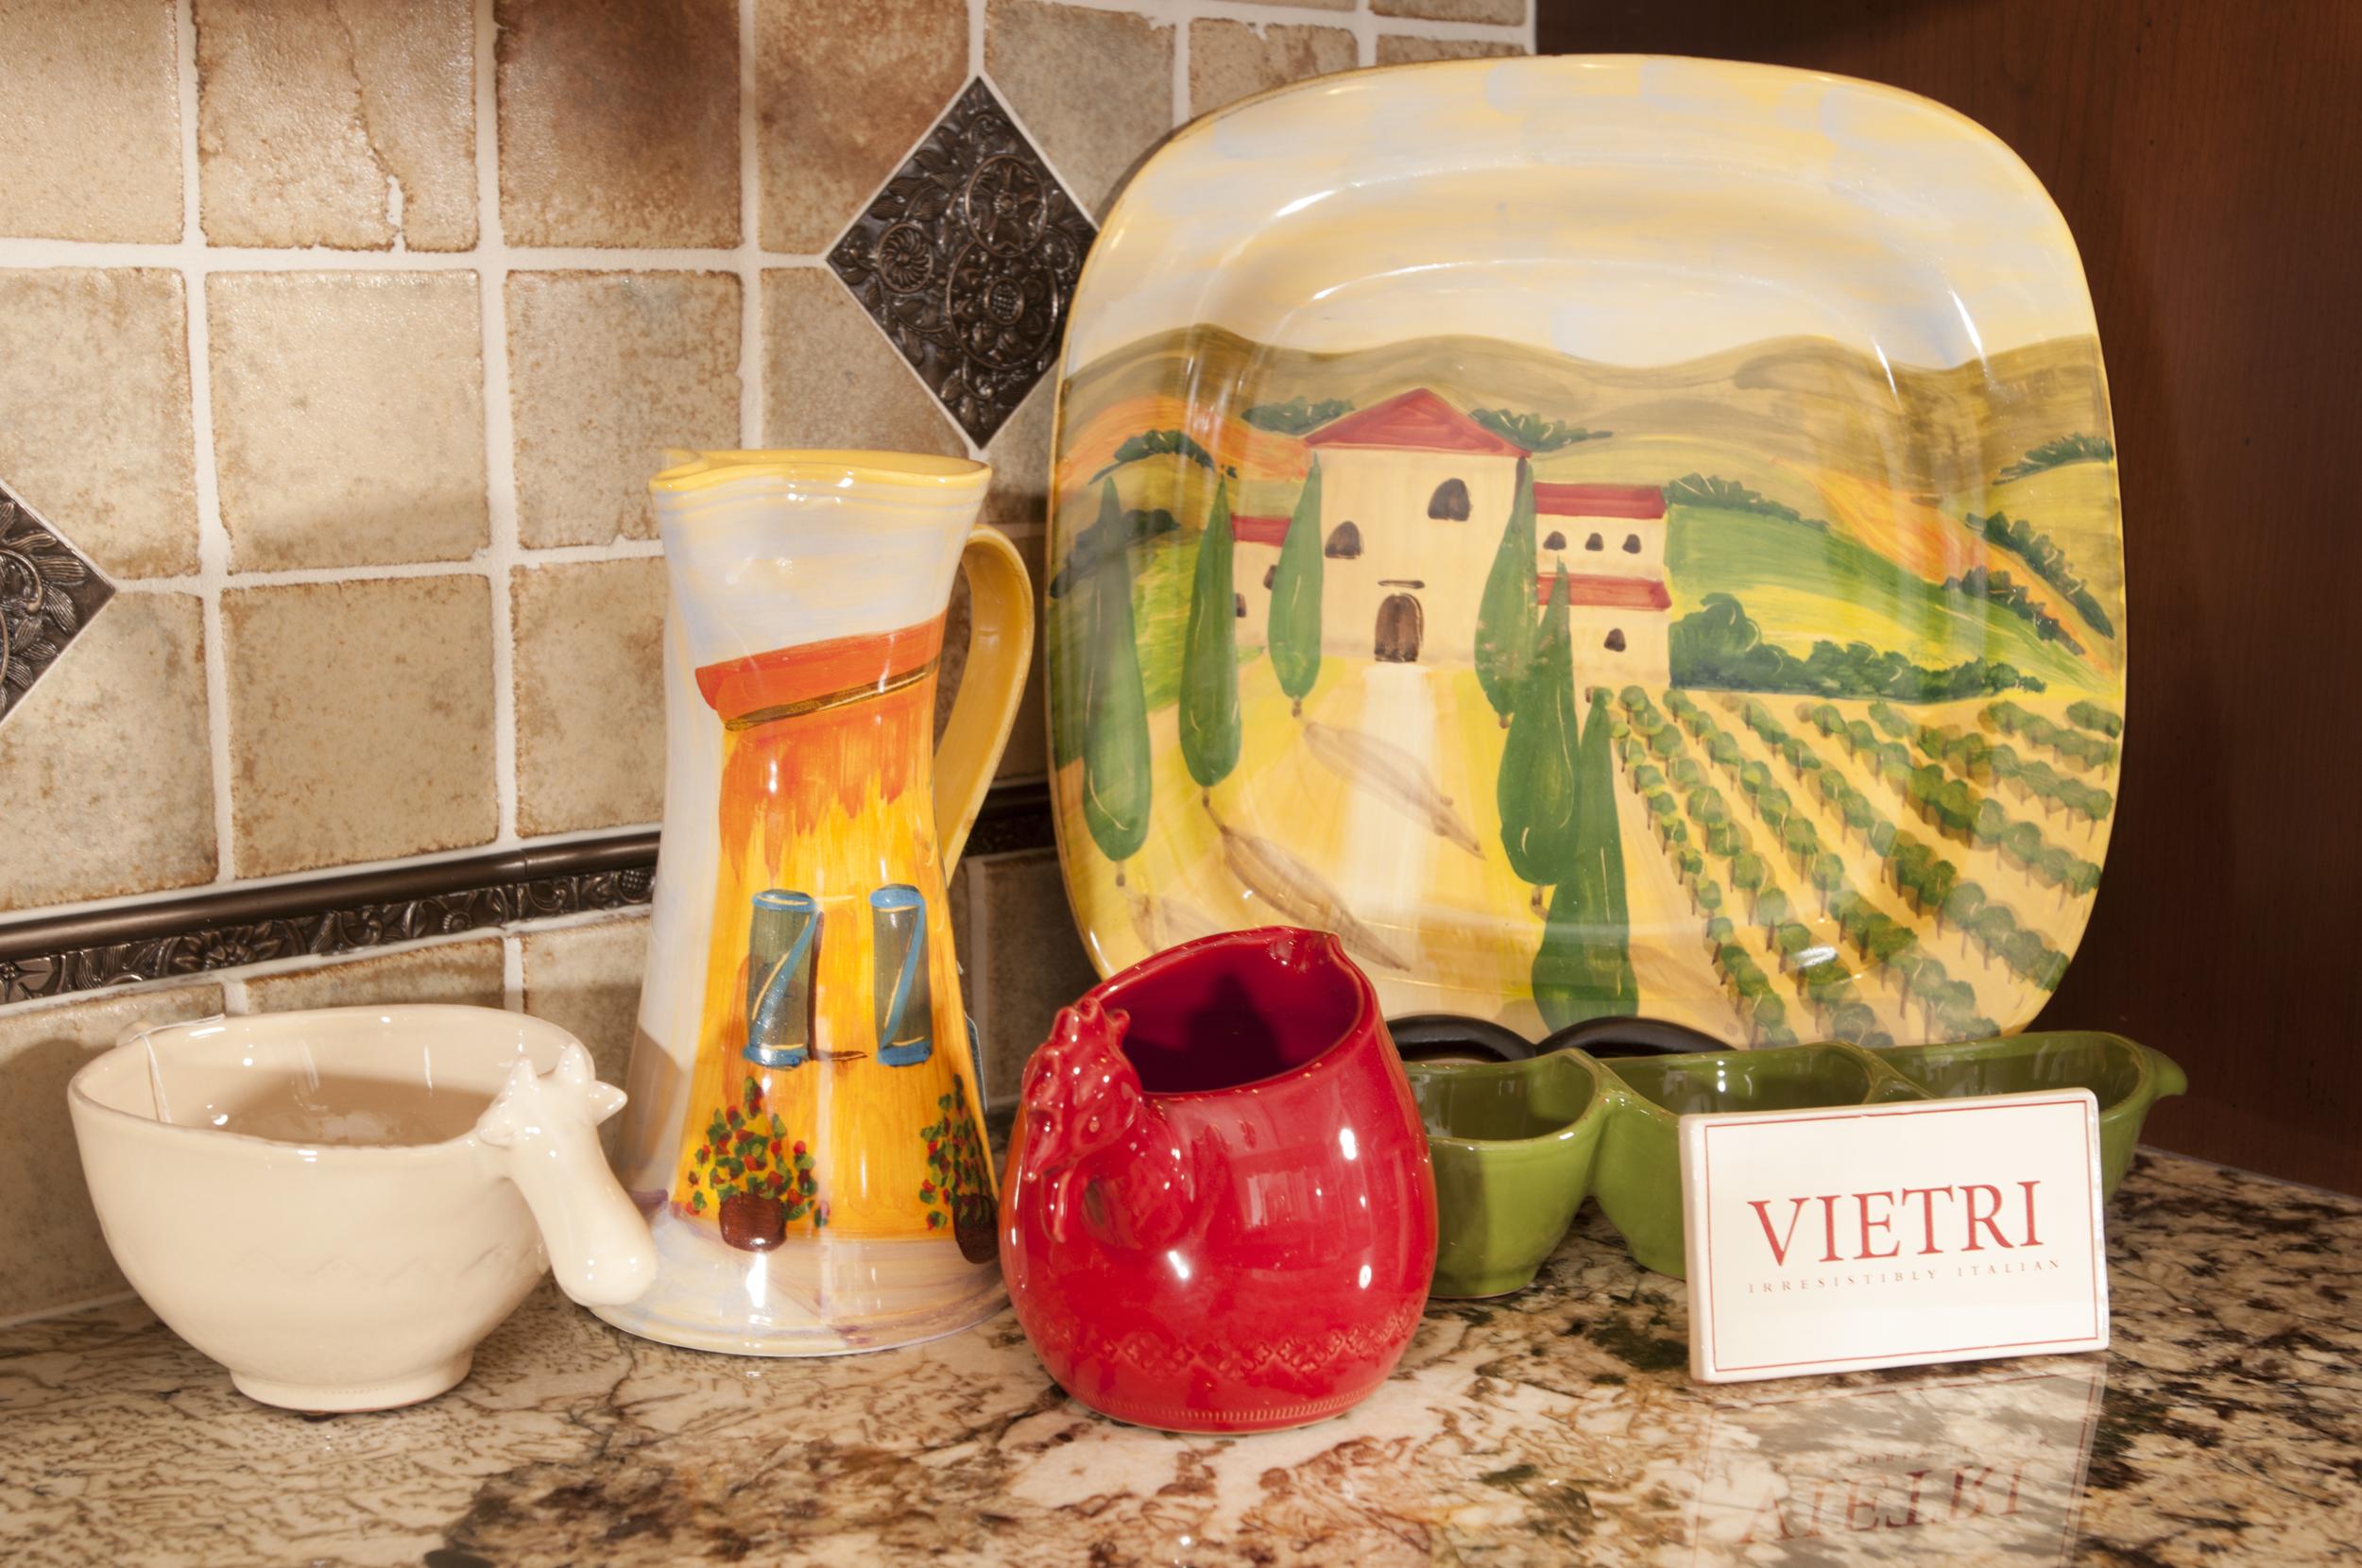 Vietri Tableware